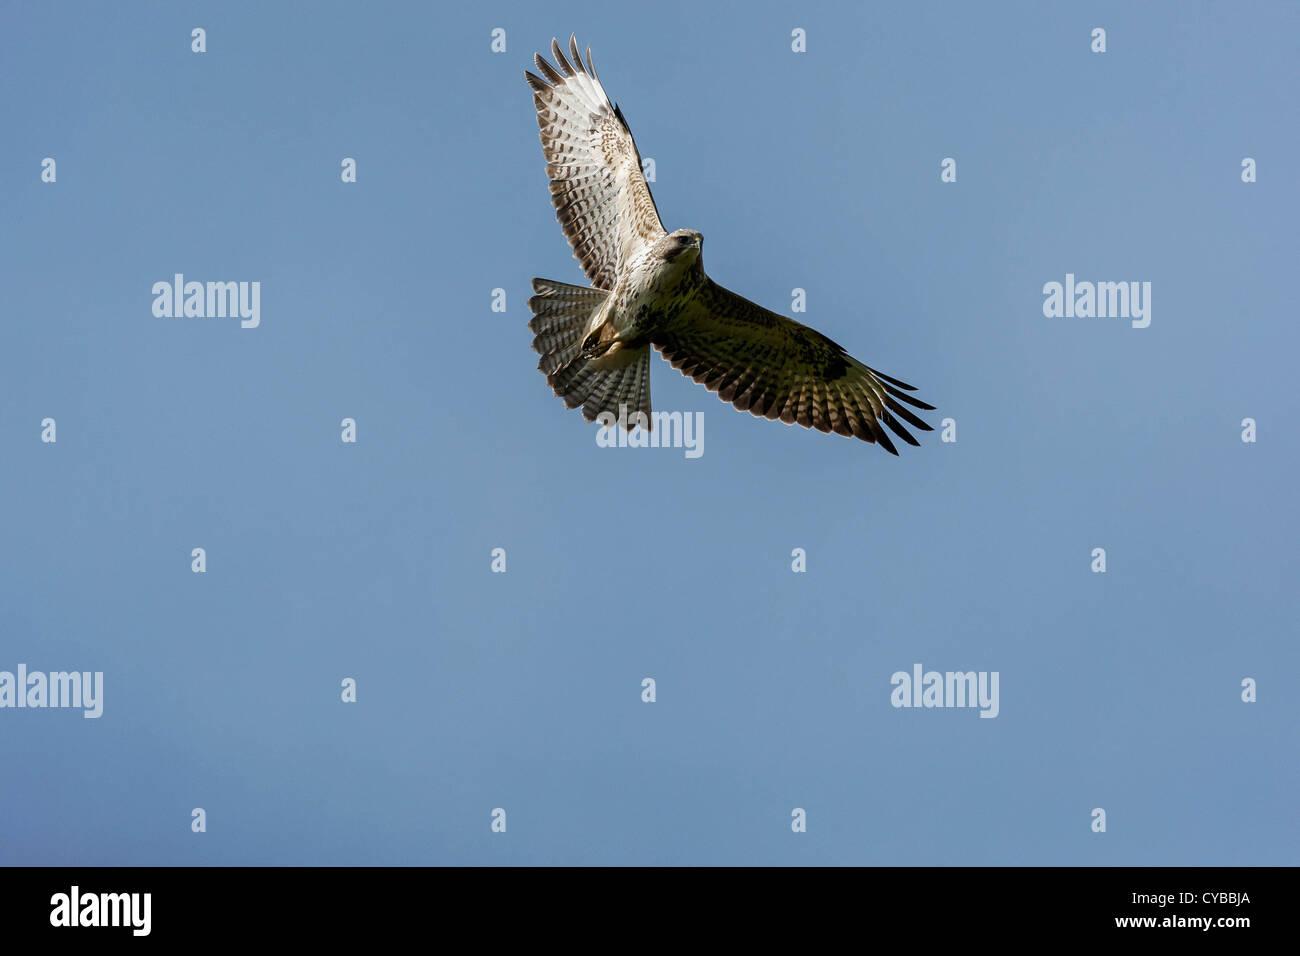 Buzzard Soars - Stock Image